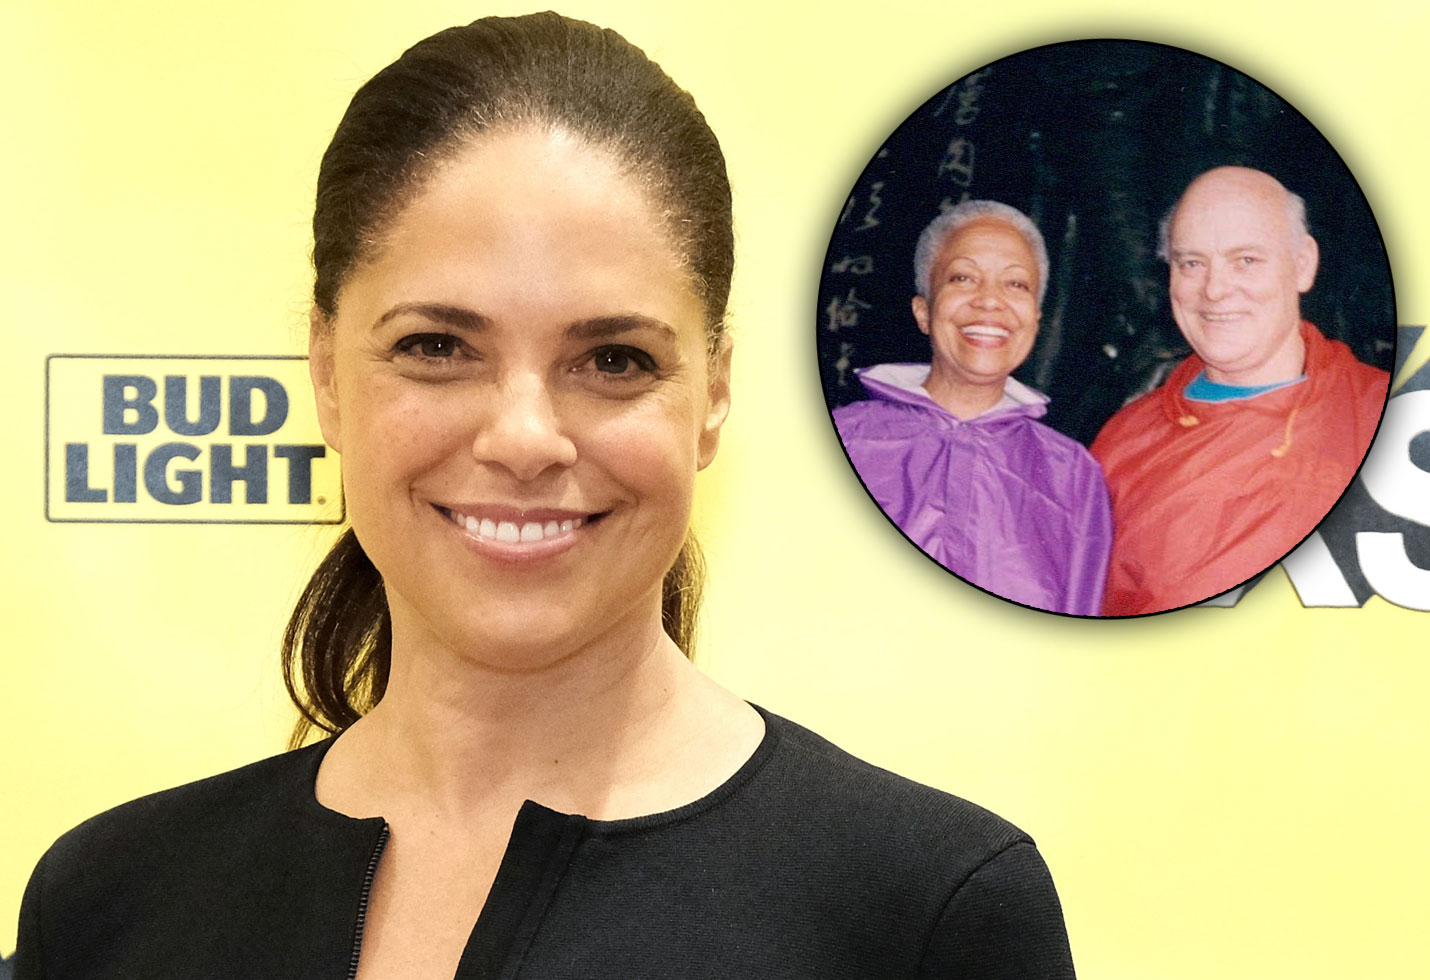 Soledad obrien mom died 40 days after dad